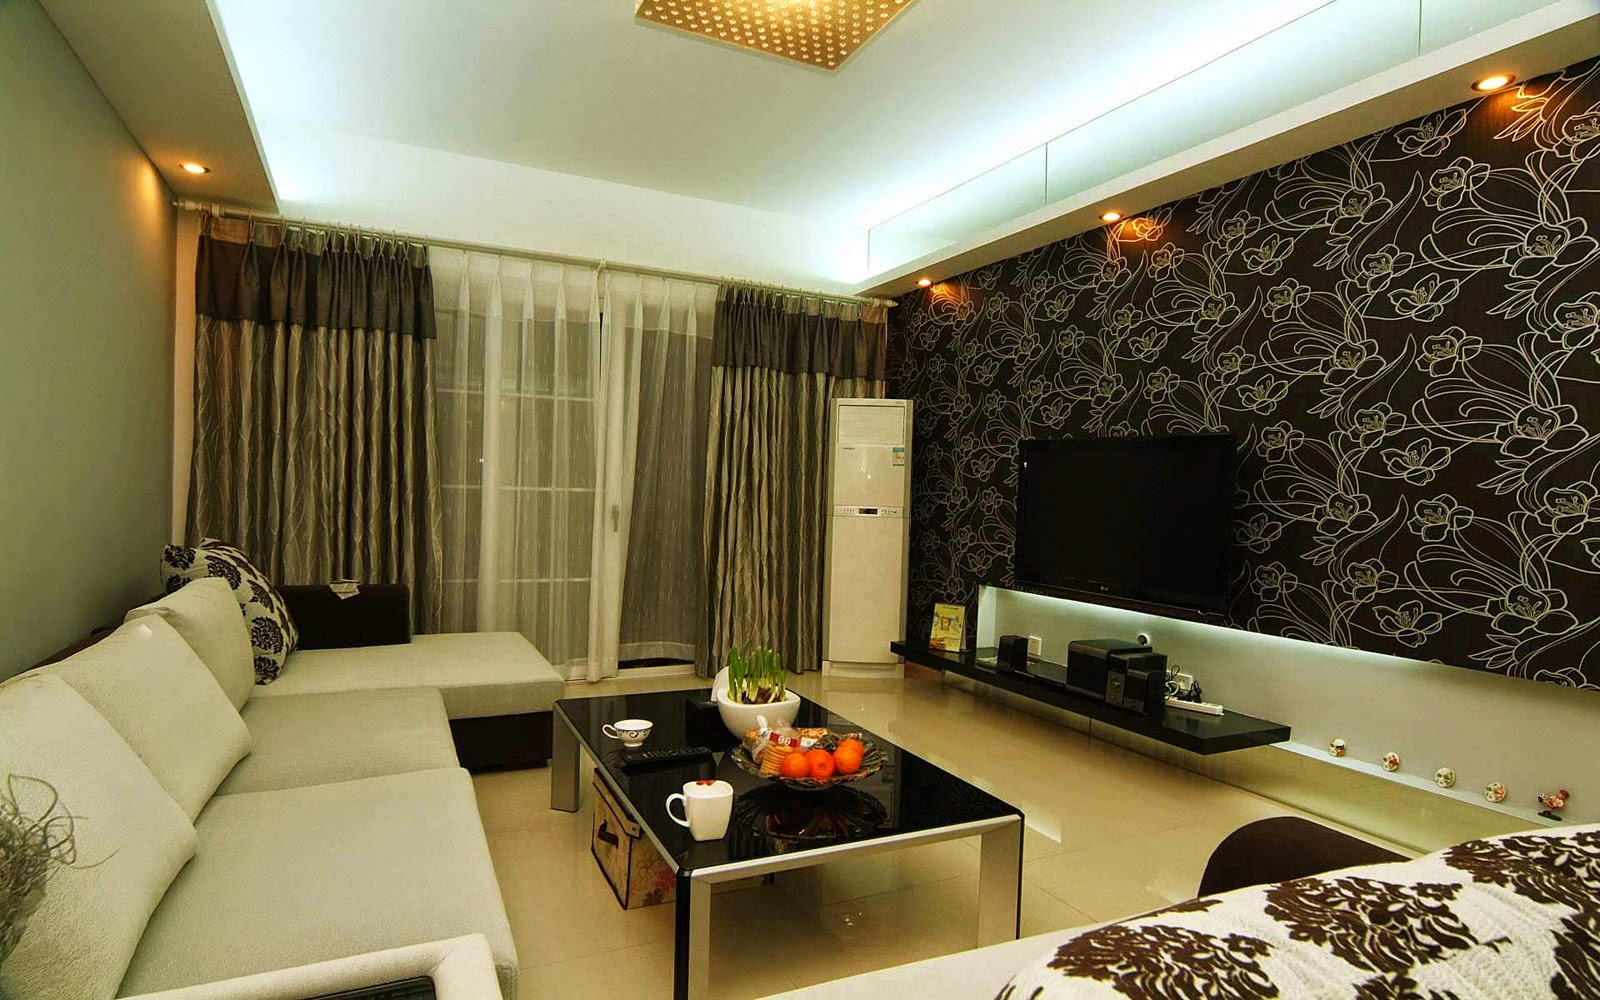 Interior-Modern-guest-room-Minimalist-Luxury-Sofa-White